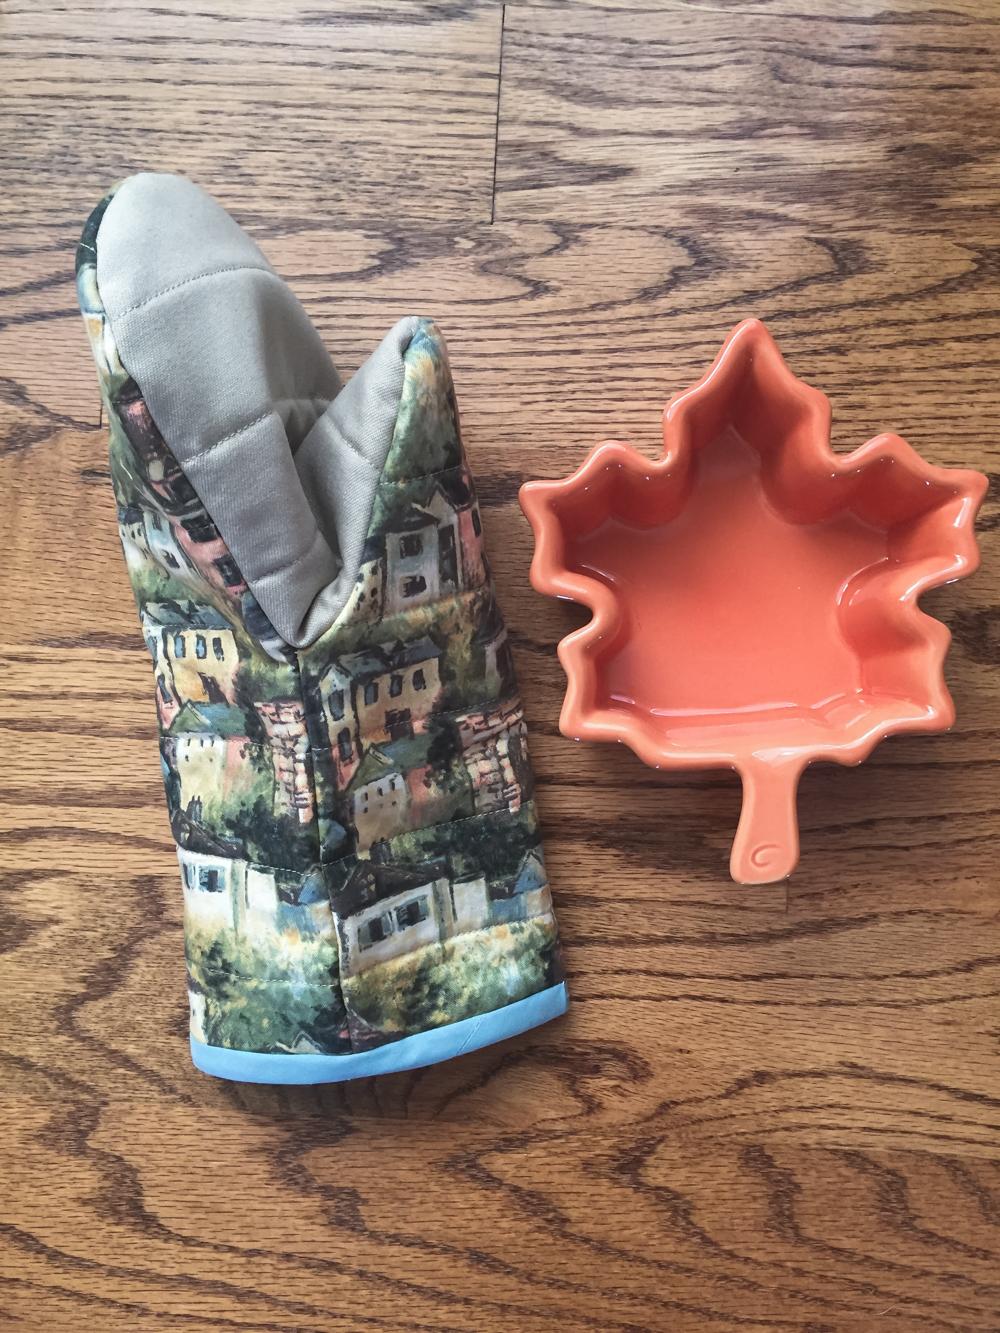 Flower City Potholder Set   Kitchen Gifts   Radiant Home Studio